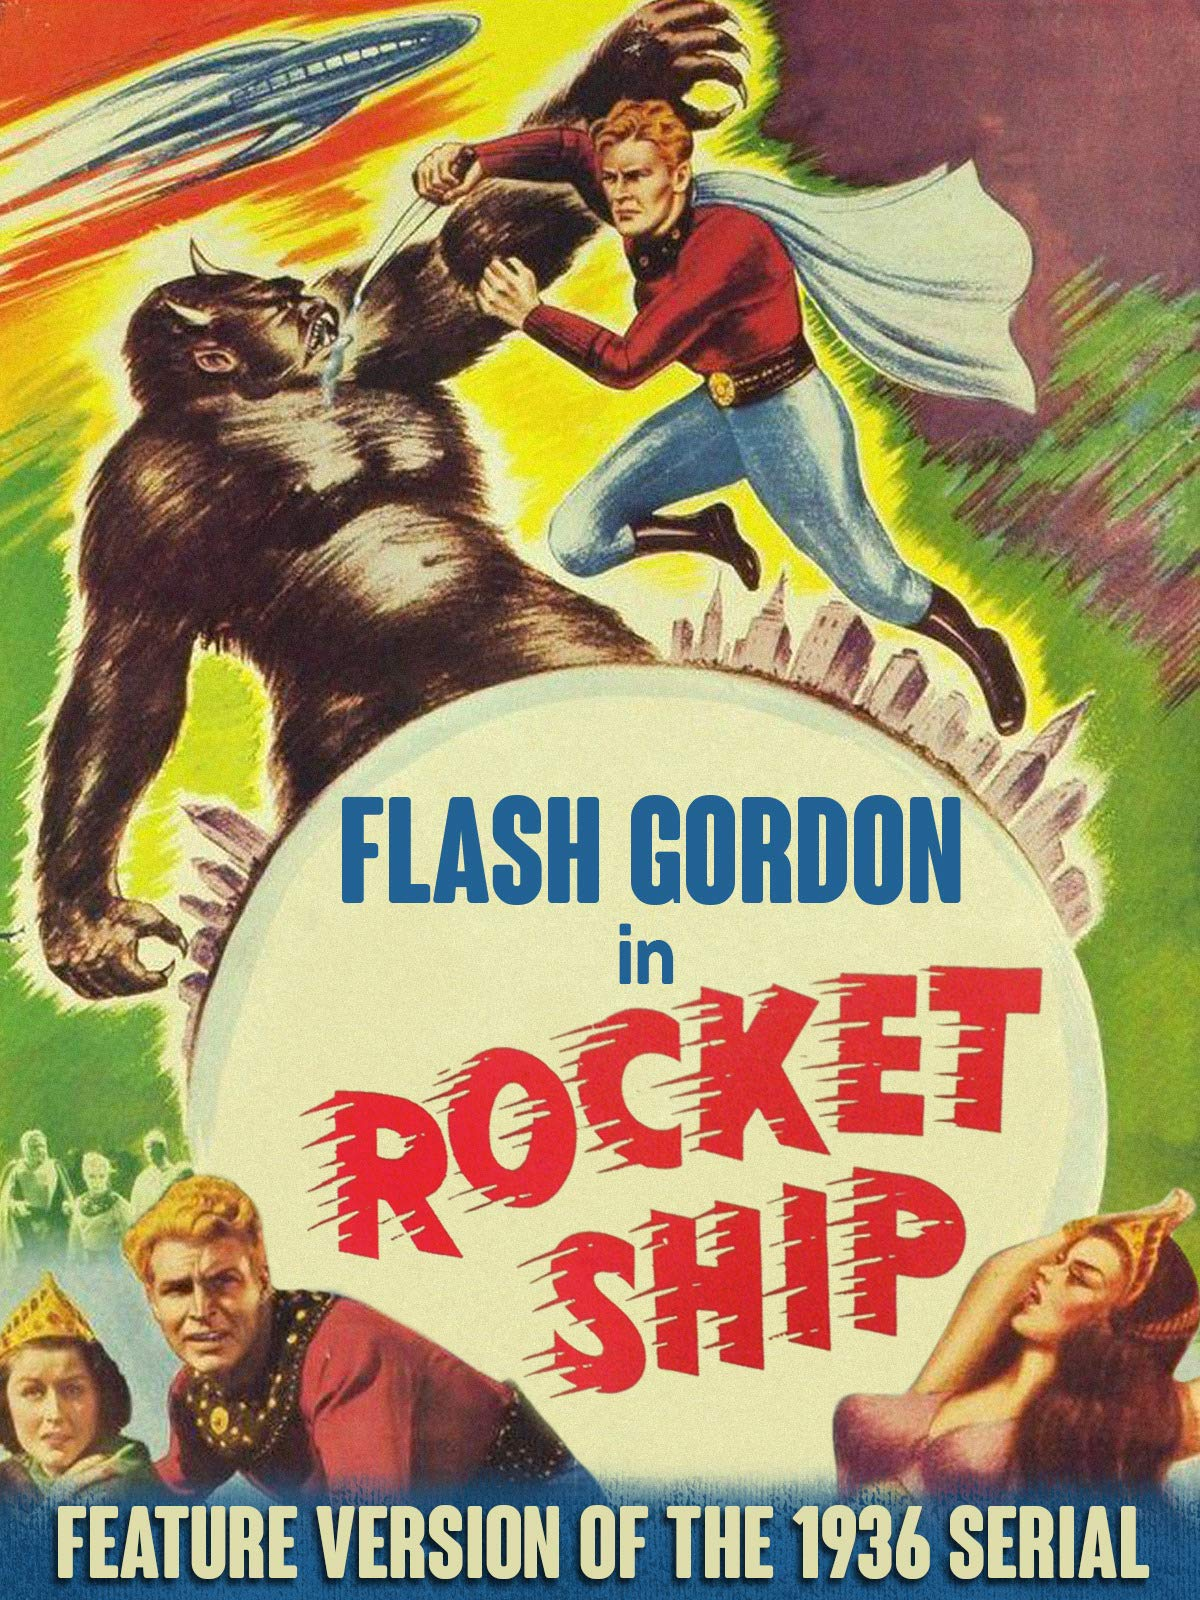 Flash Gordon in Rocketship - Feature Version of the 1936 Serial